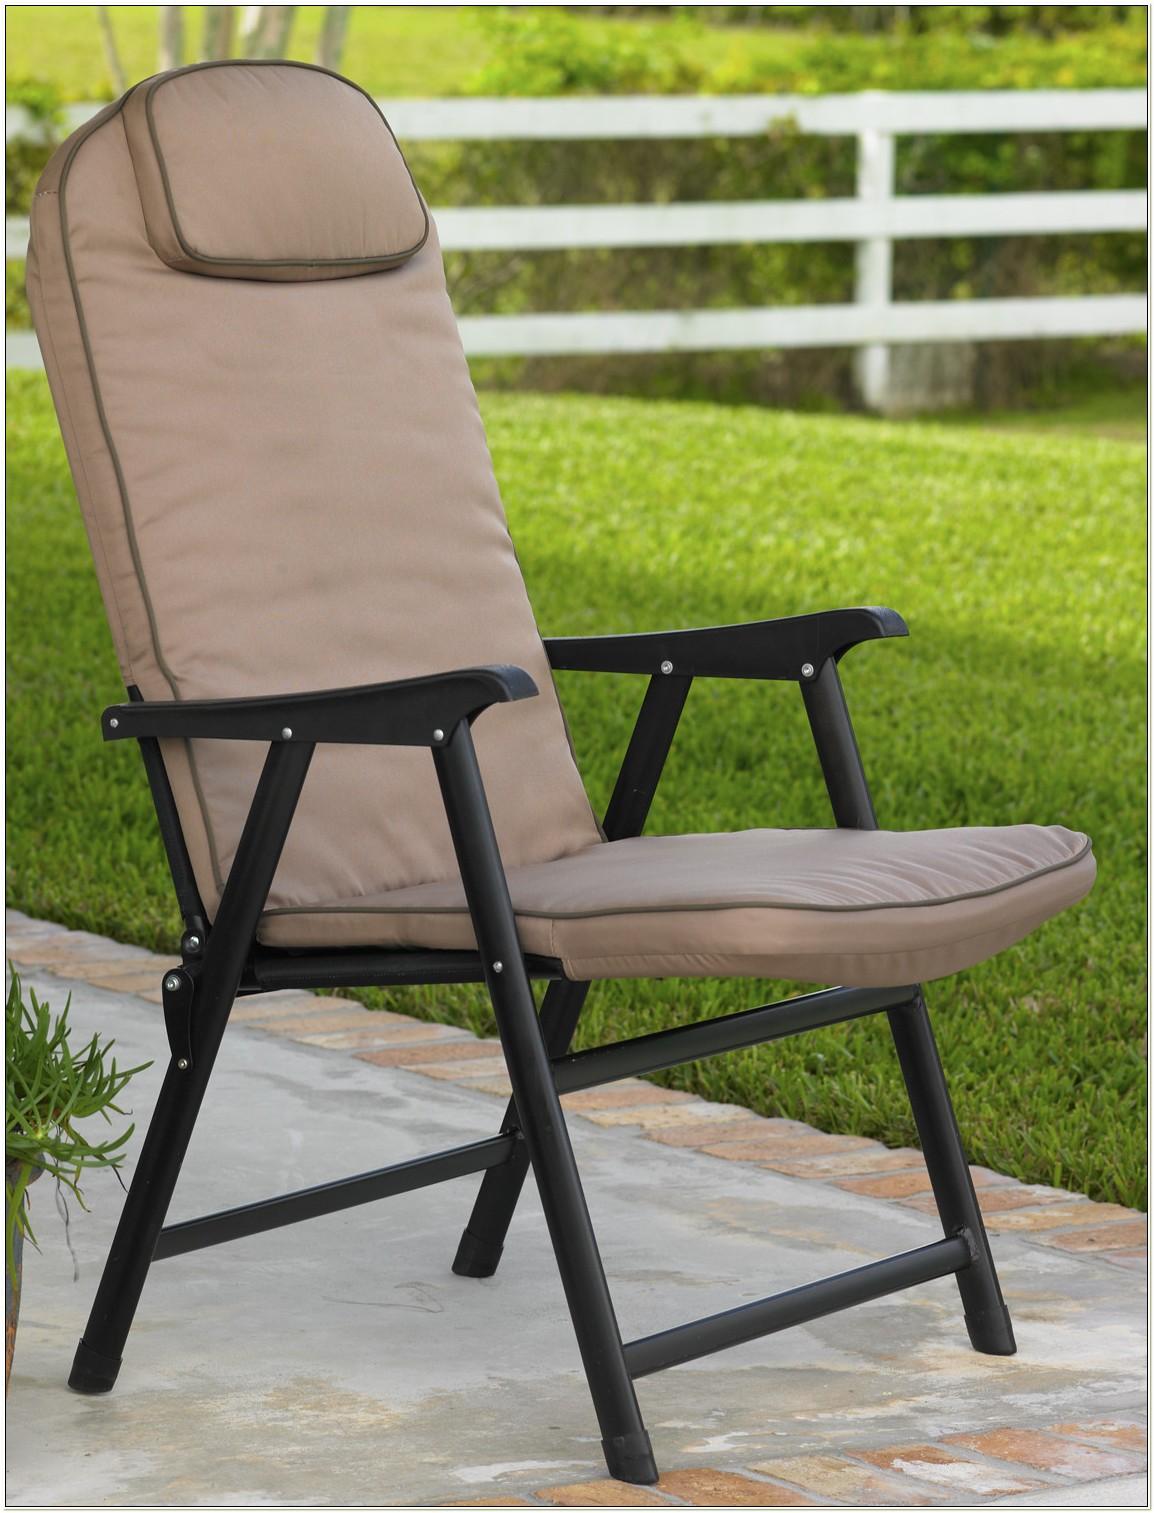 Heavy Duty Folding Patio Chairs